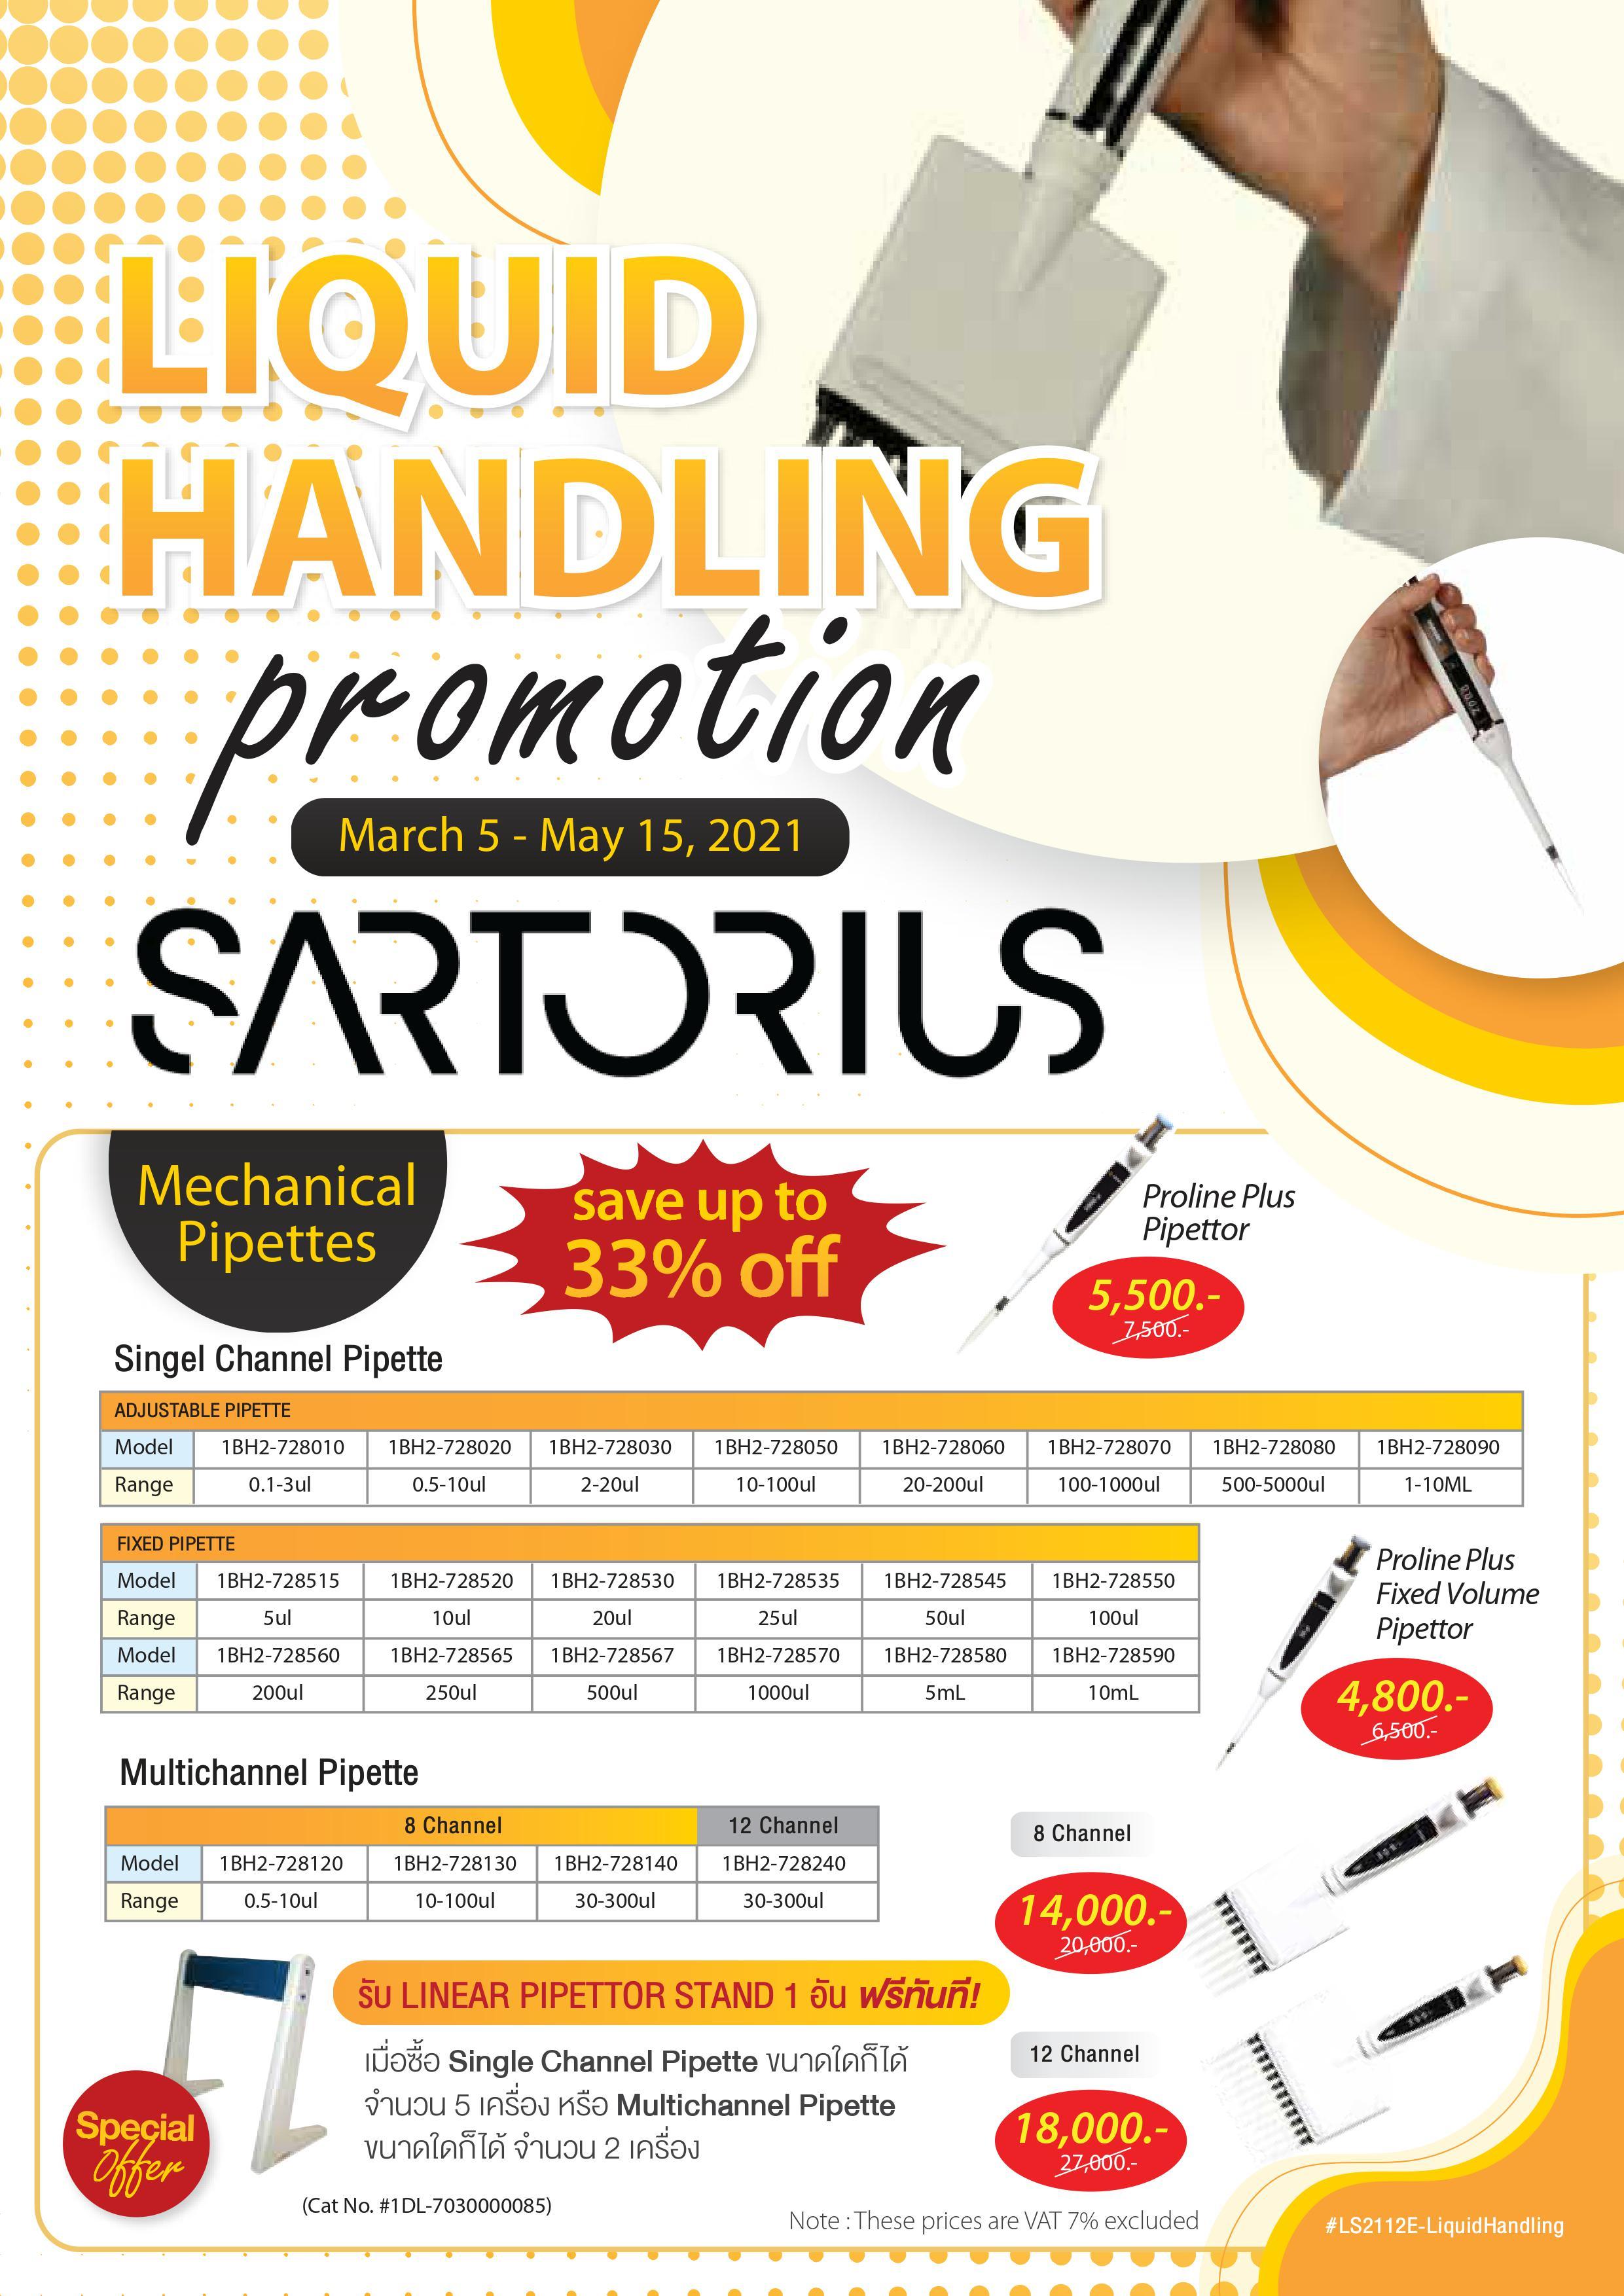 Liquid Handling Promotion